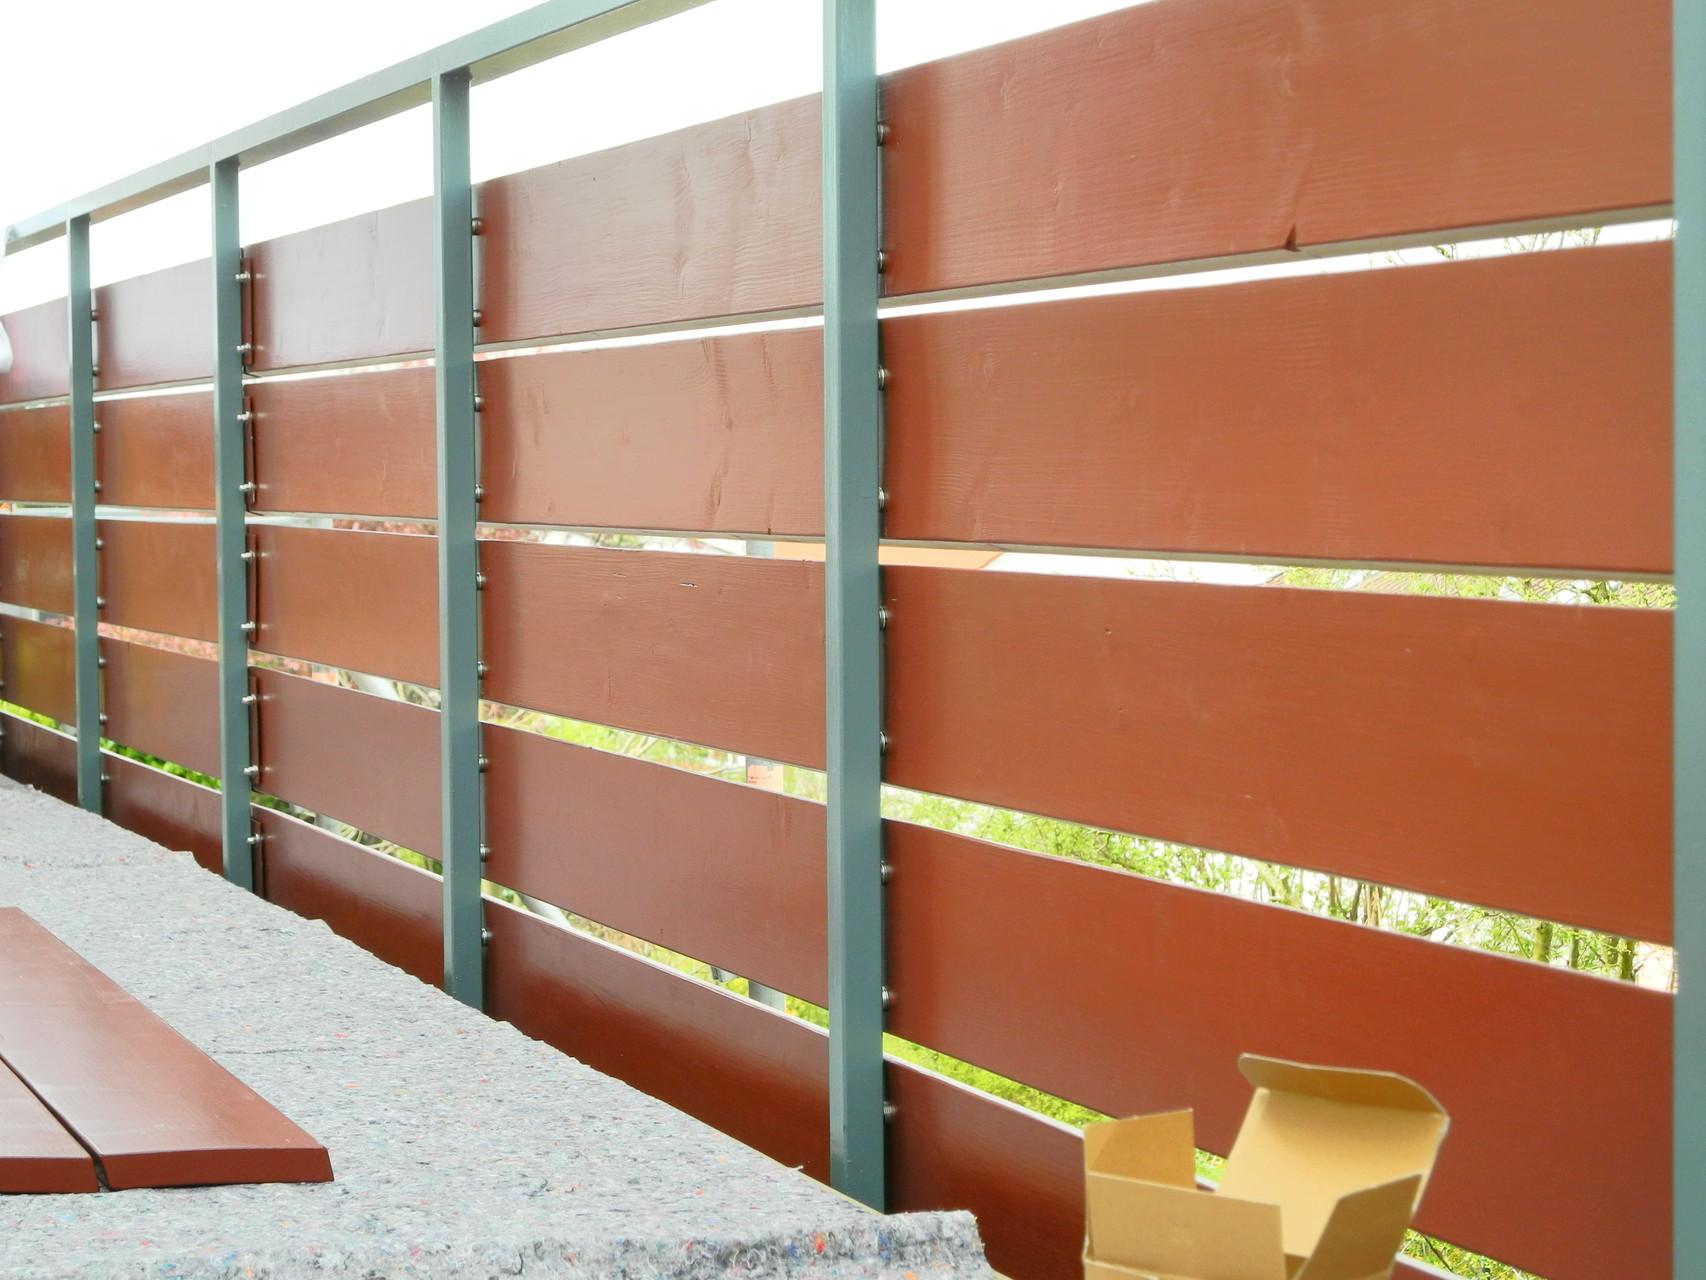 Neue Balkonbretter an bestehender Konstruktion